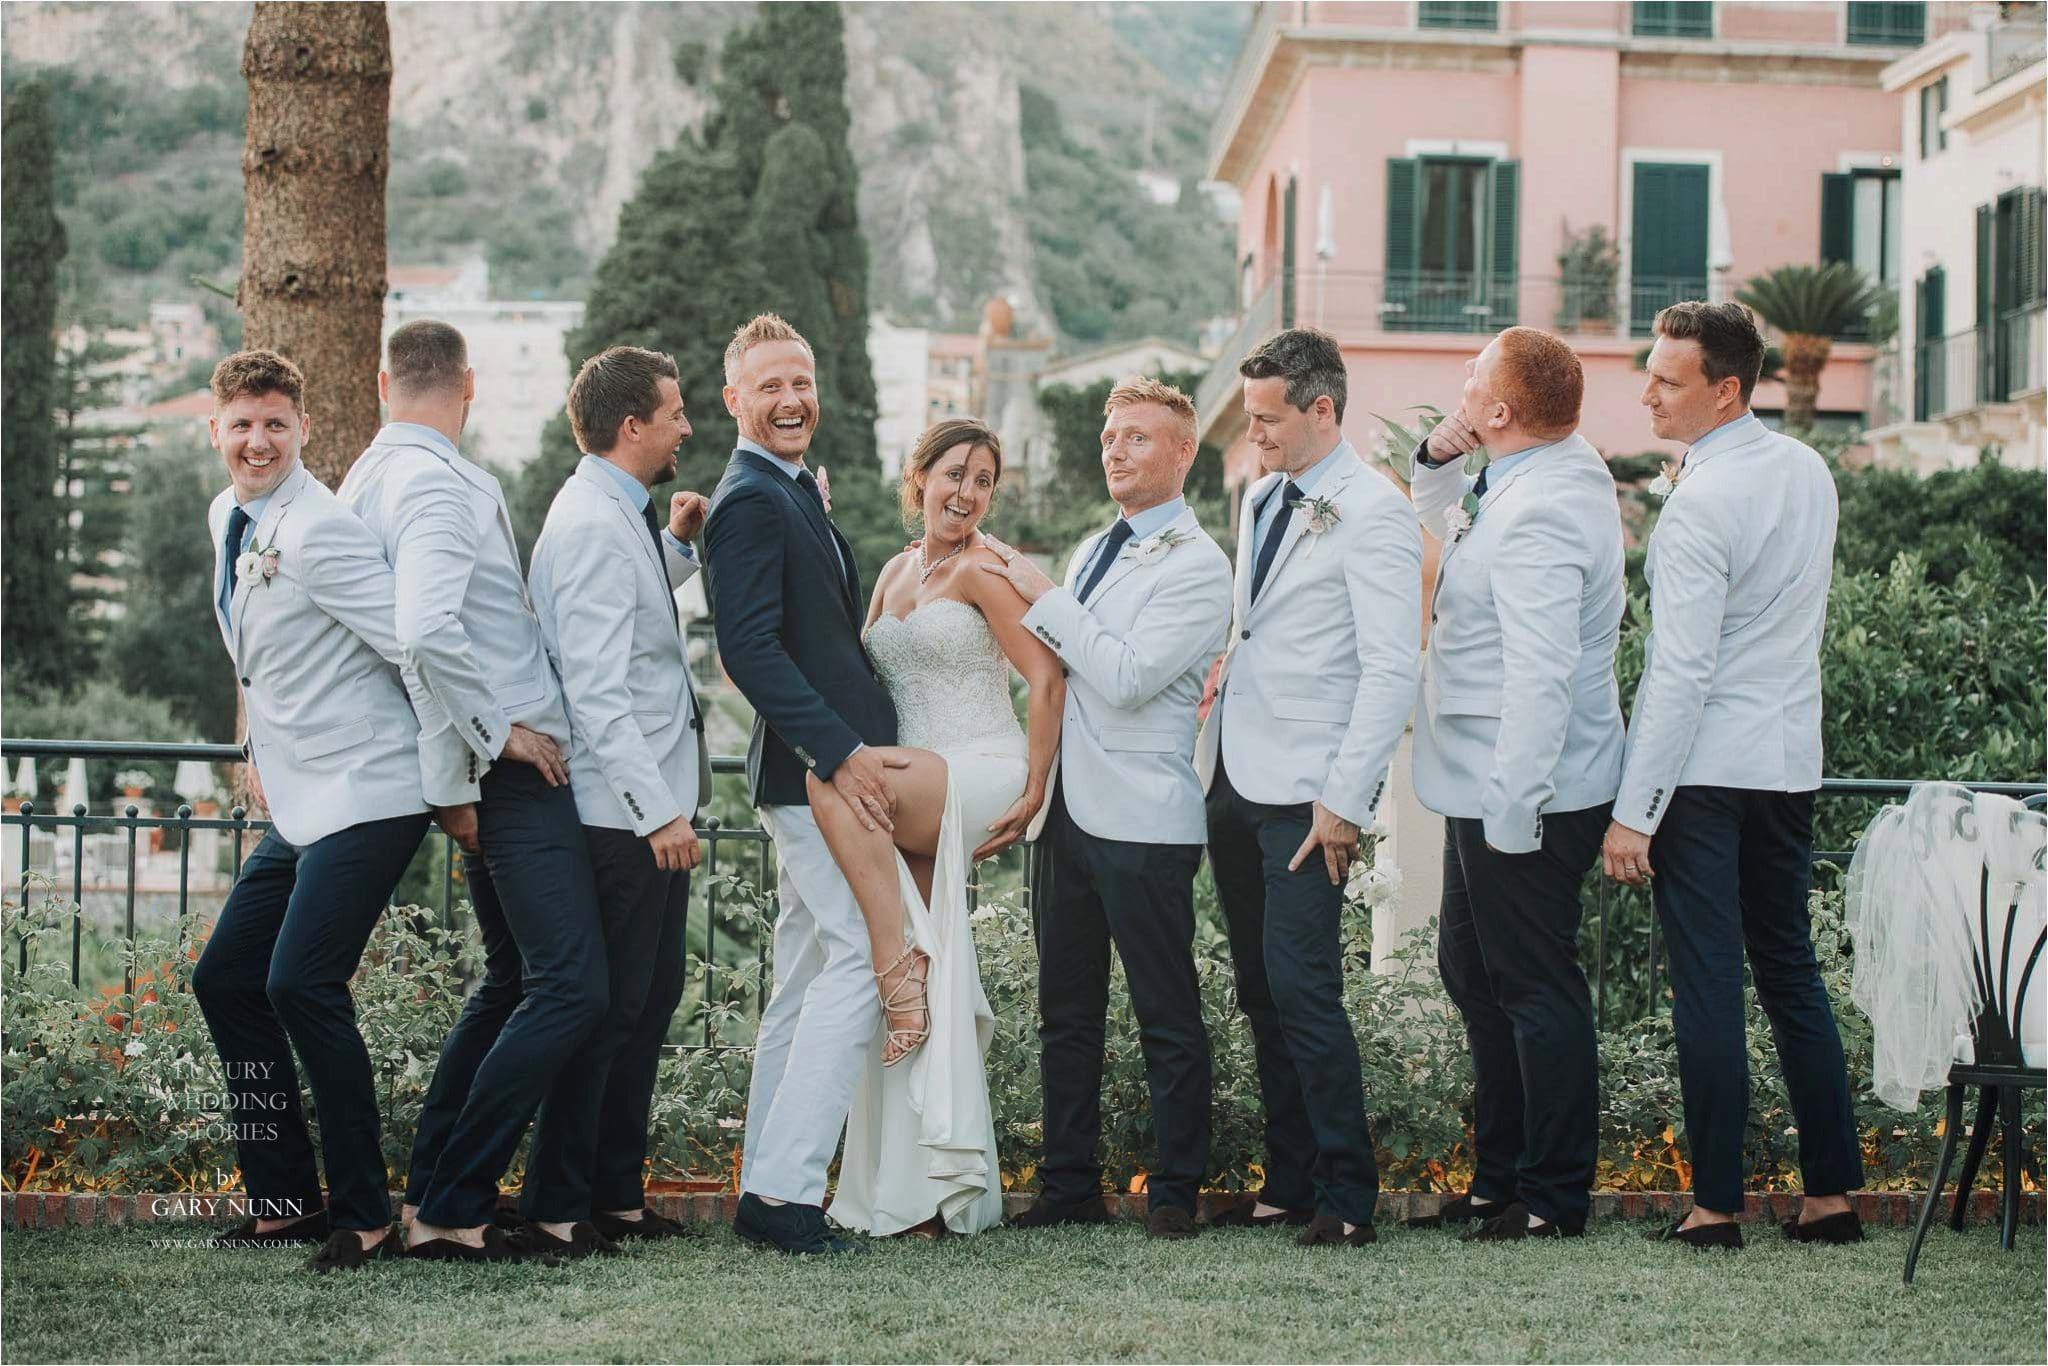 Sicily Wedding Photography, belmond grand hotel timeo, destination wedding photographer italy, Gary Nunn Photography, grand hotel timeo, mount etna, sicily, sicily wedding photography, top 10 wedding photographers, wedding photograpgher leighton buzzard, weddings in Taormina